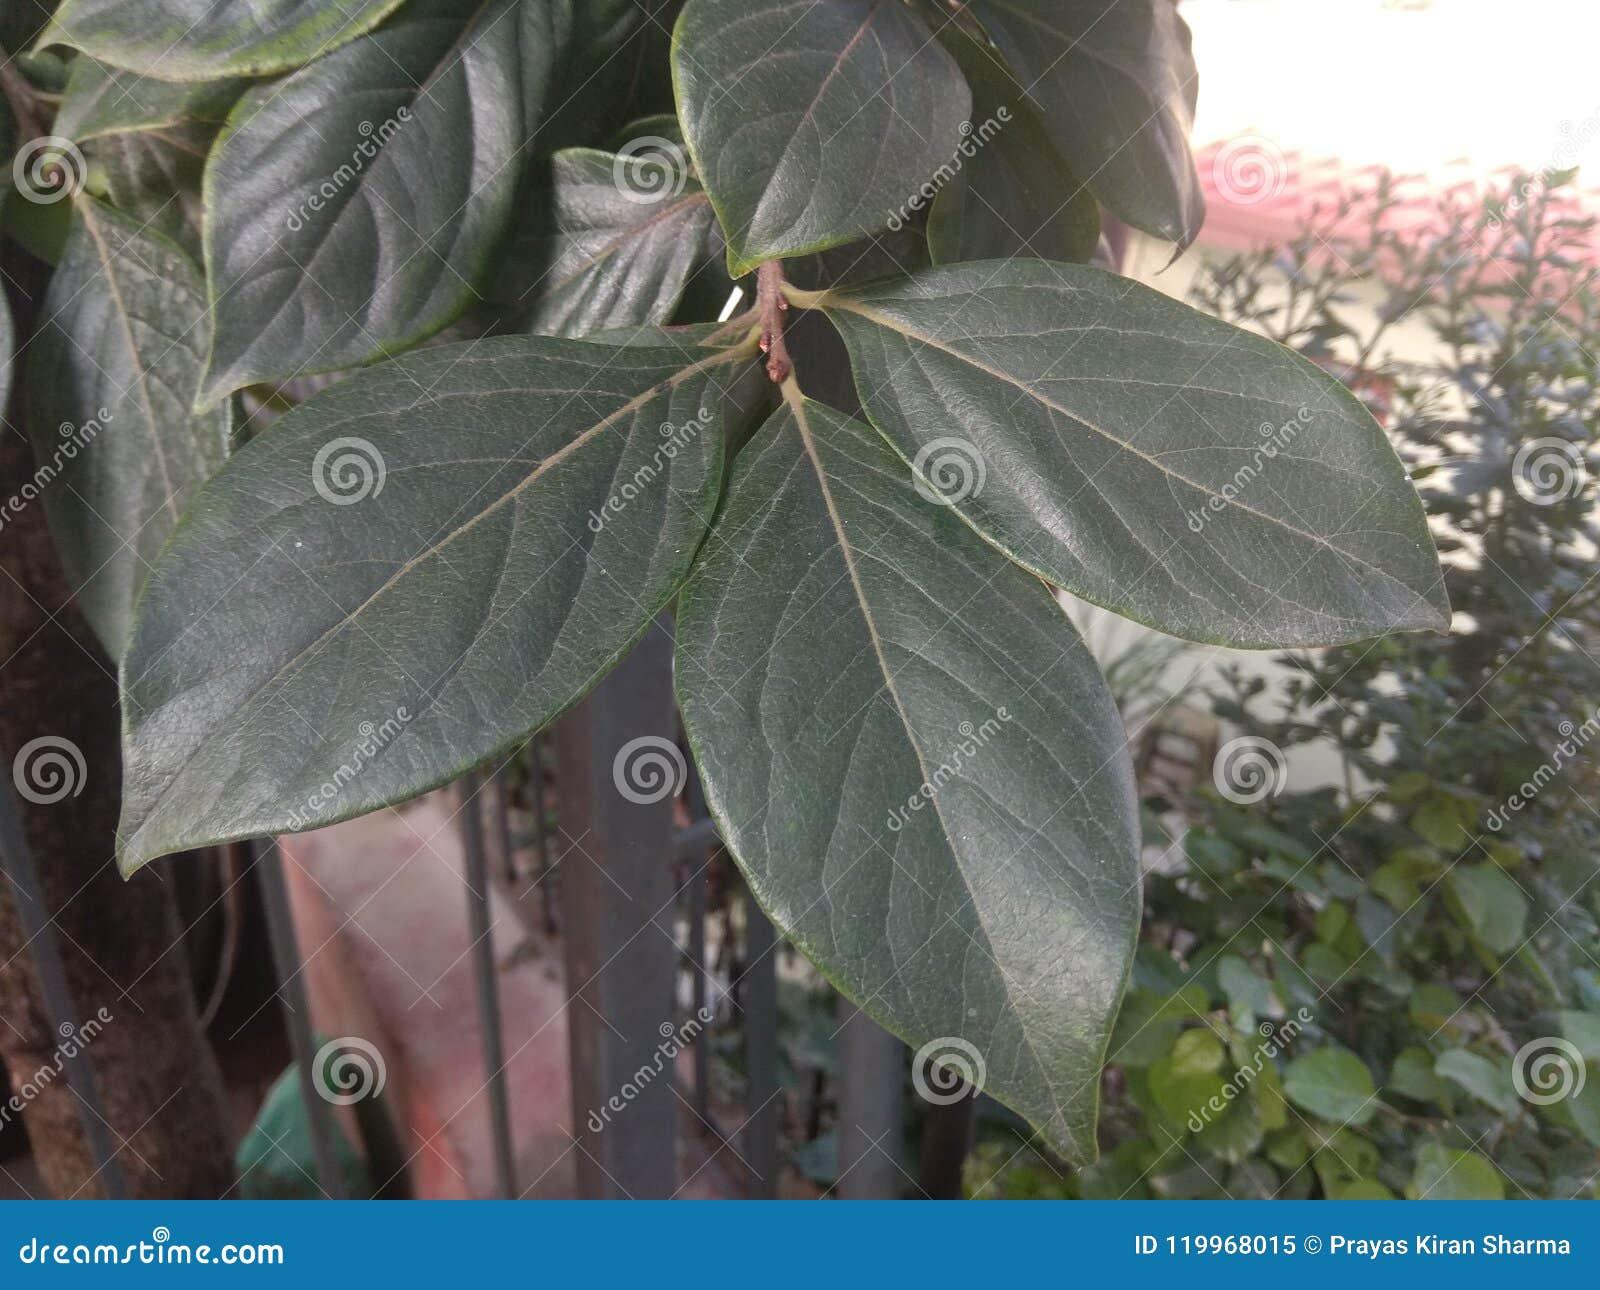 Nepalese Plum Leaf is a species of flowering plant